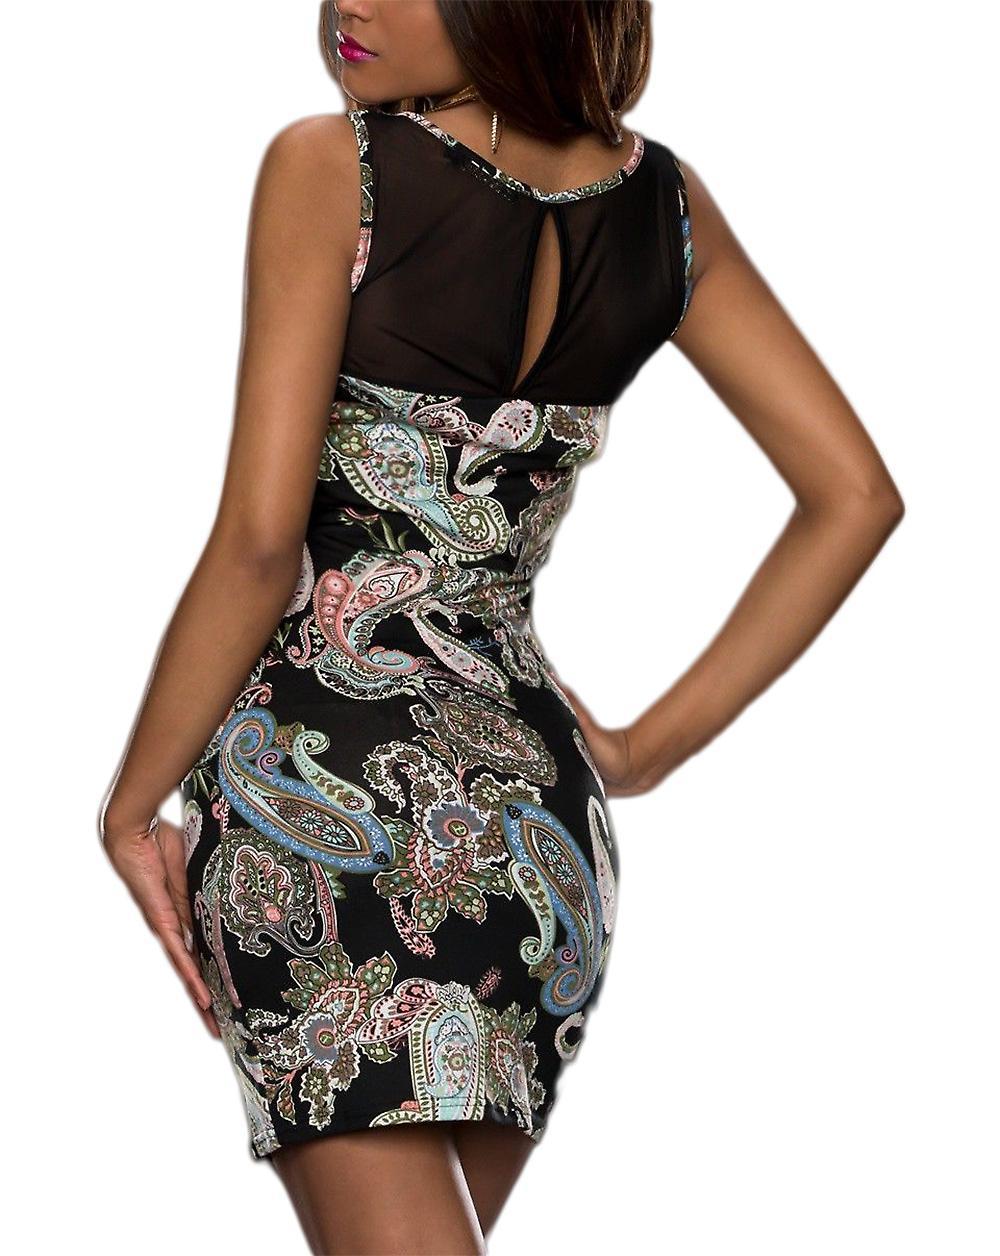 Waooh - Floral Print Dress Madory